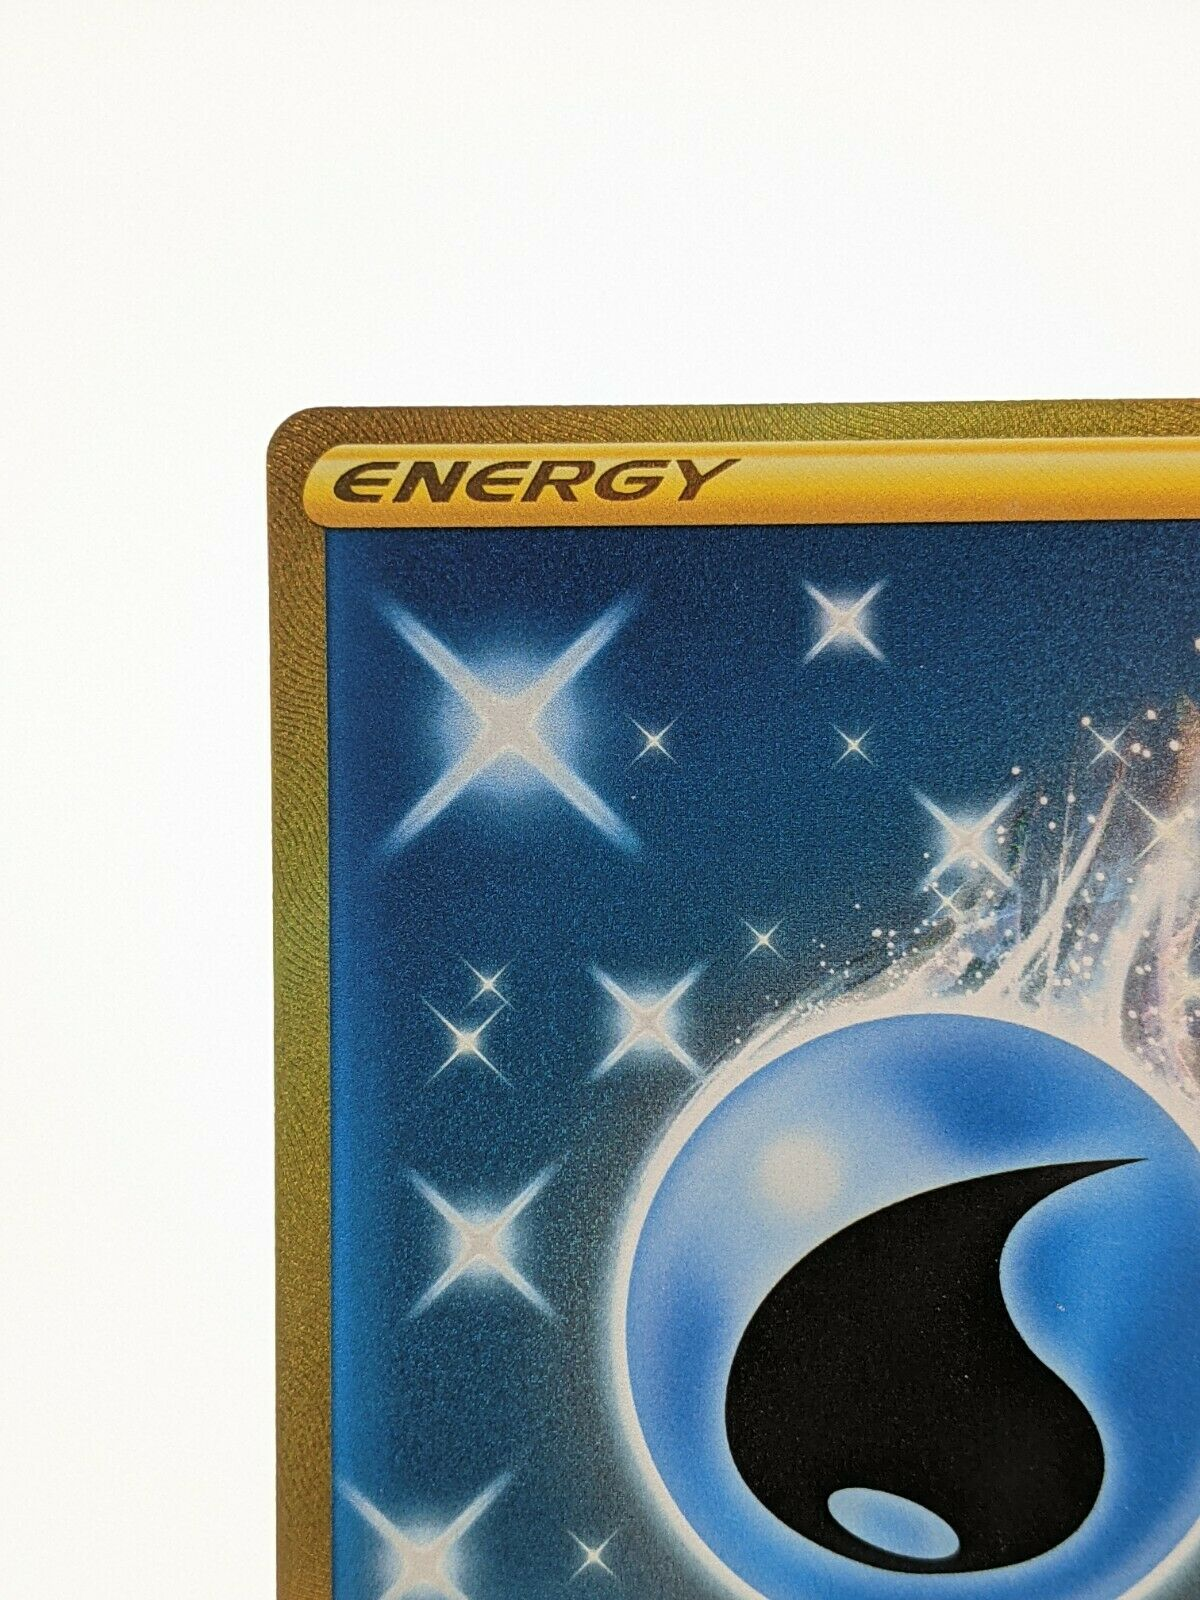 Water Energy 231/198 Chilling Reign Pokemon TCG Secret Rare NM - Image 3